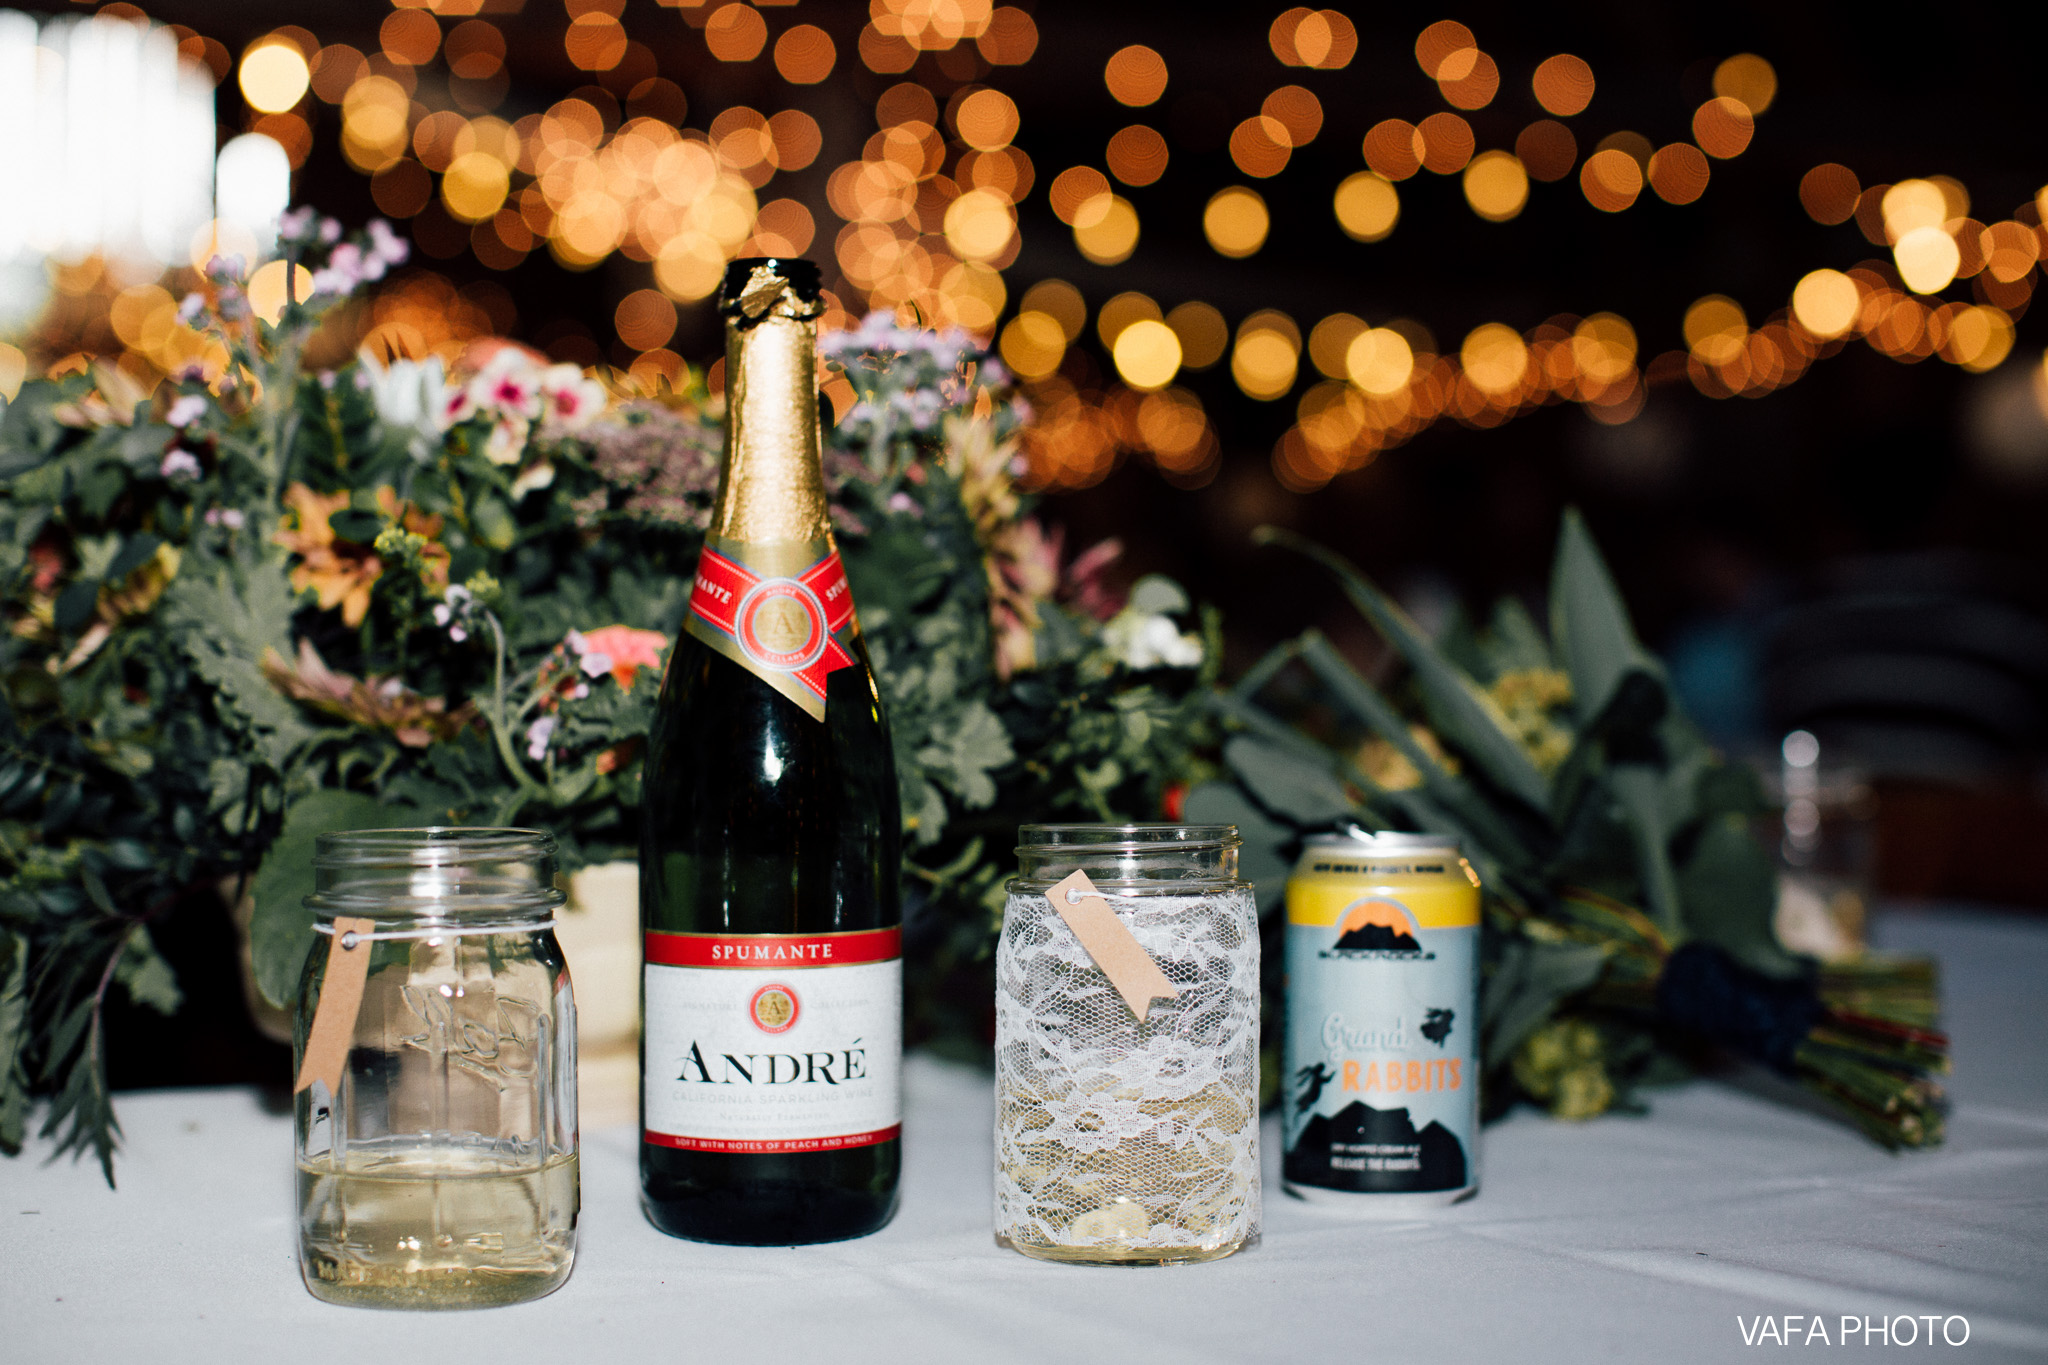 Belsolda-Farm-Wedding-Christy-Eric-Vafa-Photo-604.jpg